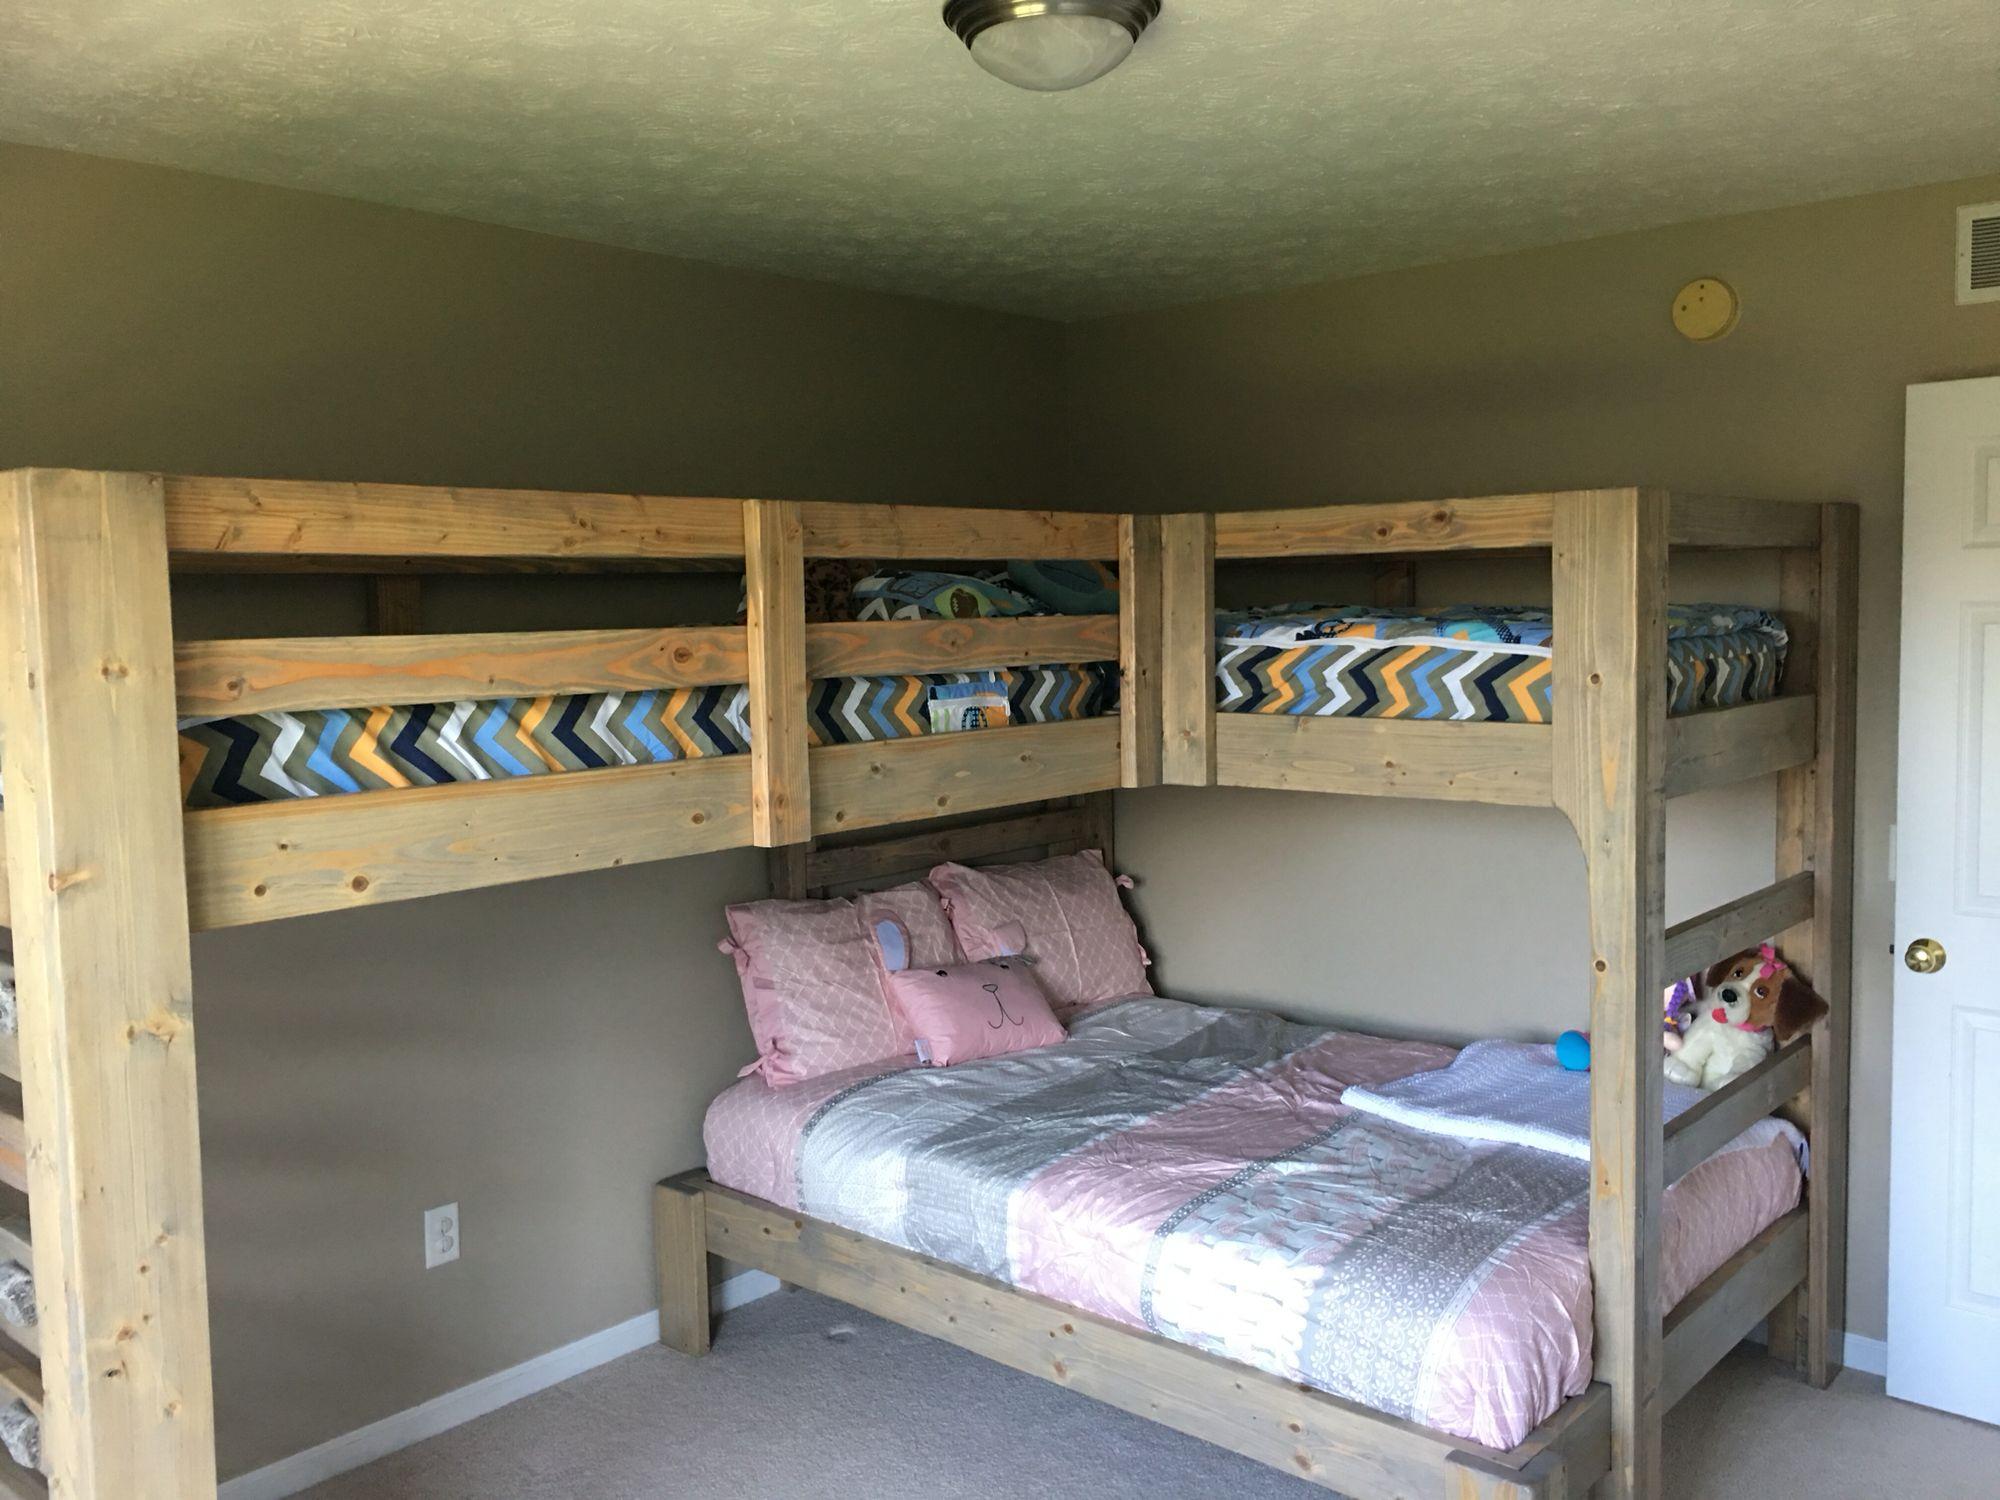 Pin By Danielle Weightman On Kids Rooms Diy Bunk Bed Kids Loft